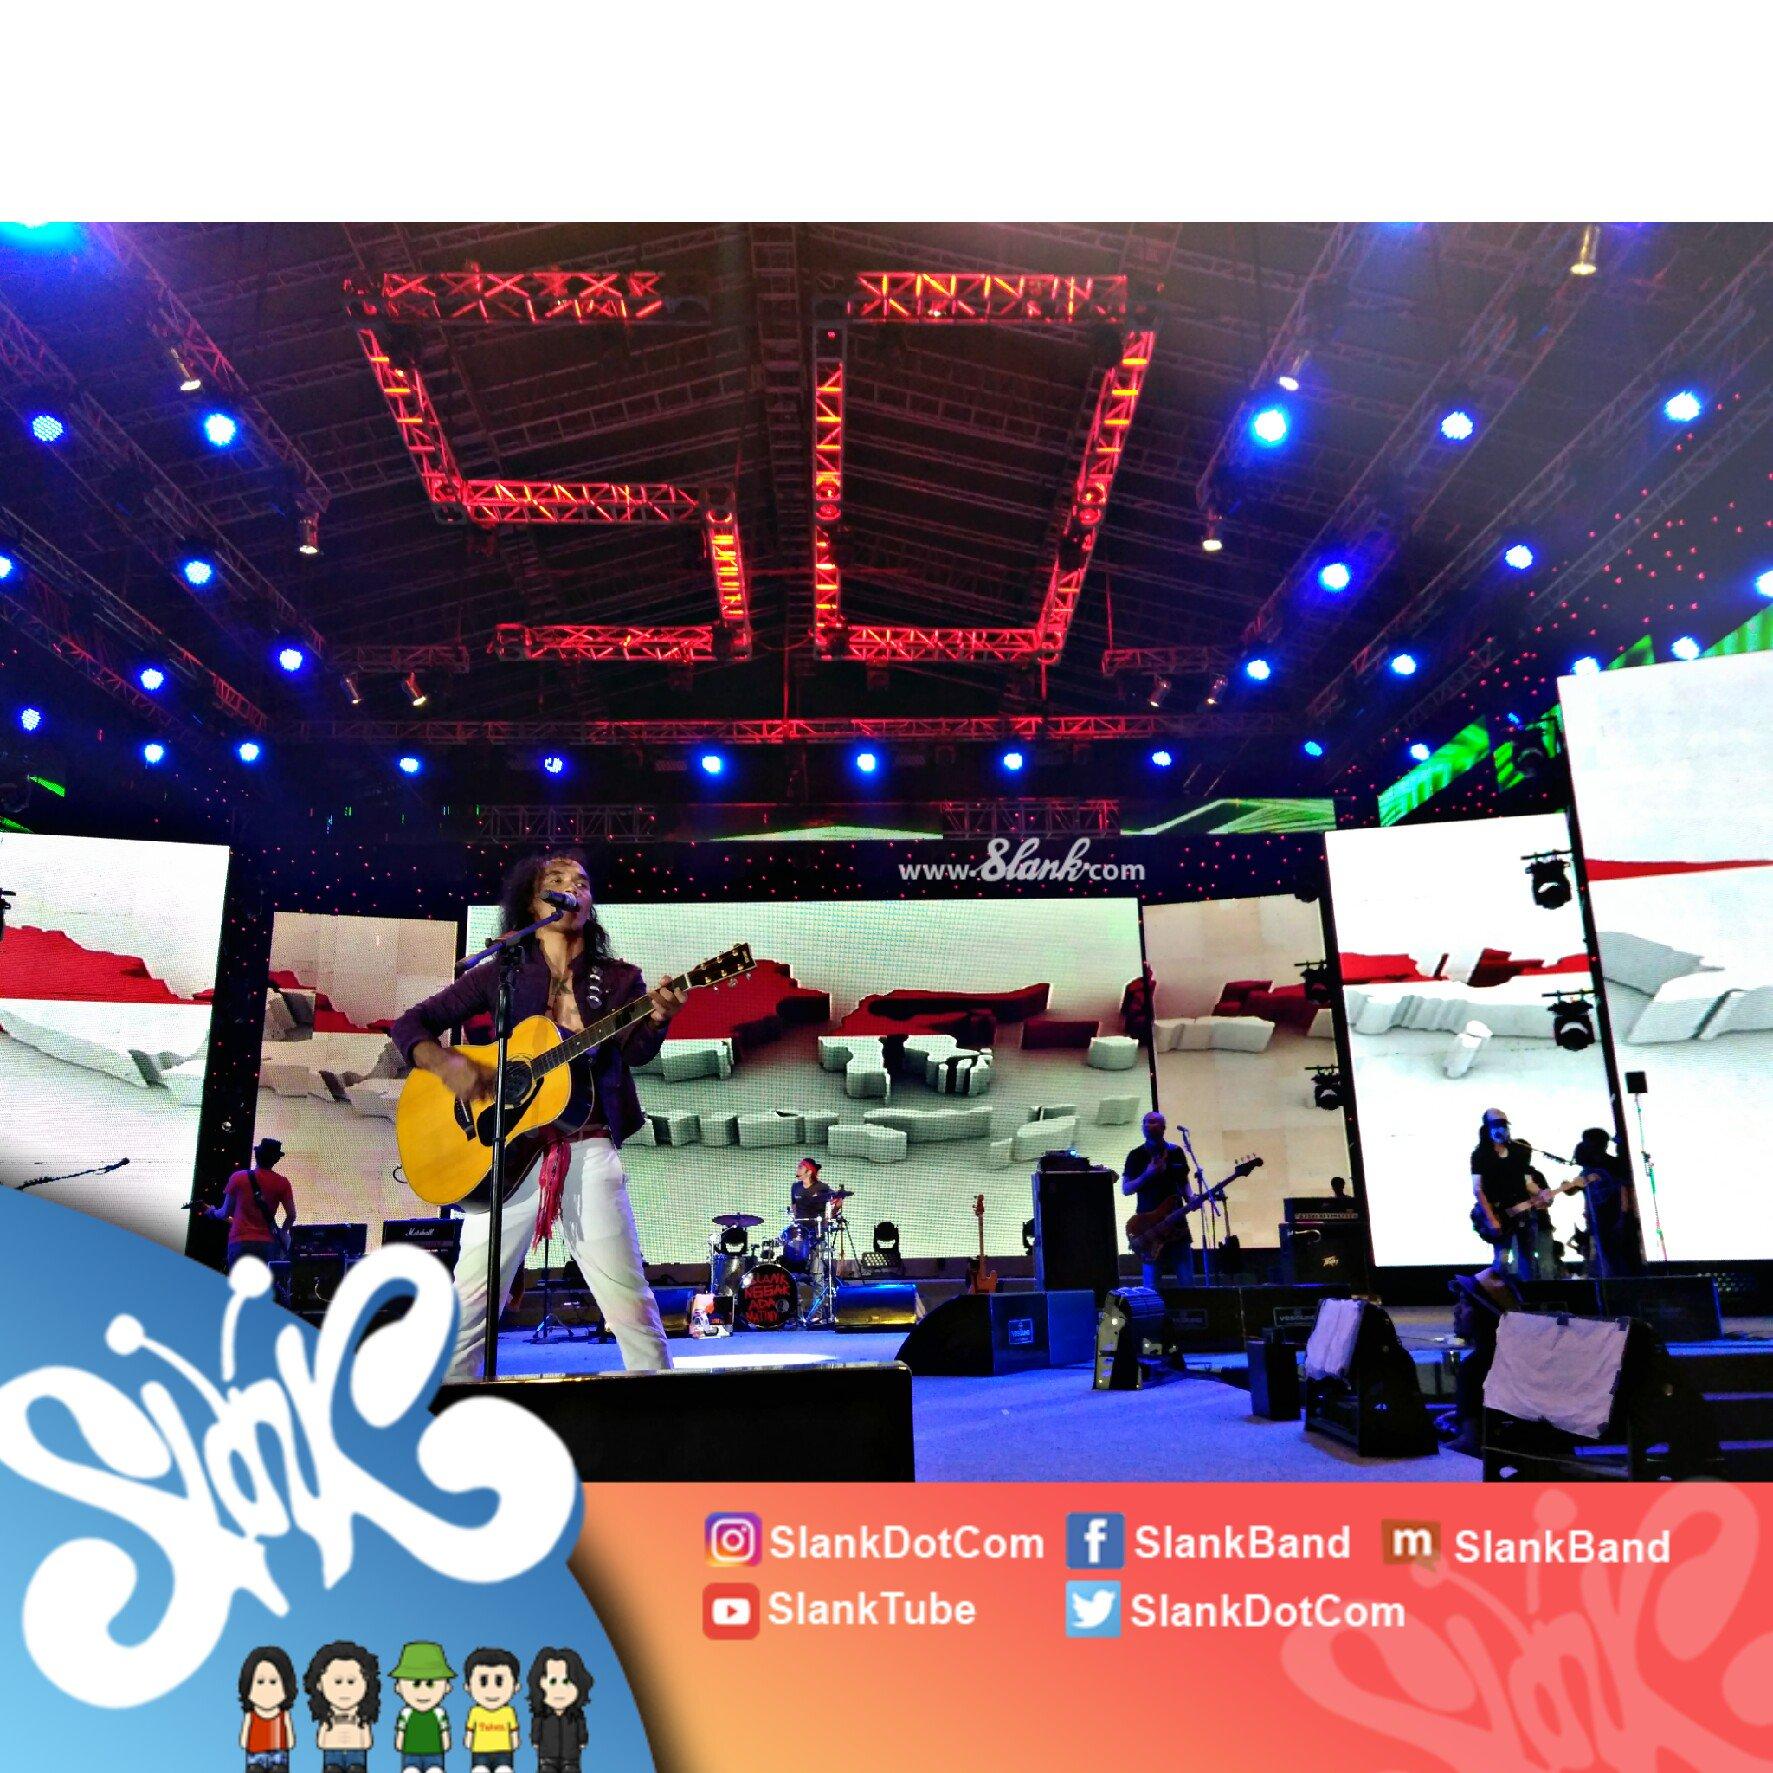 Terima kasih Jakarta! Semua damai, semua tenang, semua senang ikutan #ngeSlankRameRame bareng #SlankBerlima! https://t.co/bLKv63qwNC